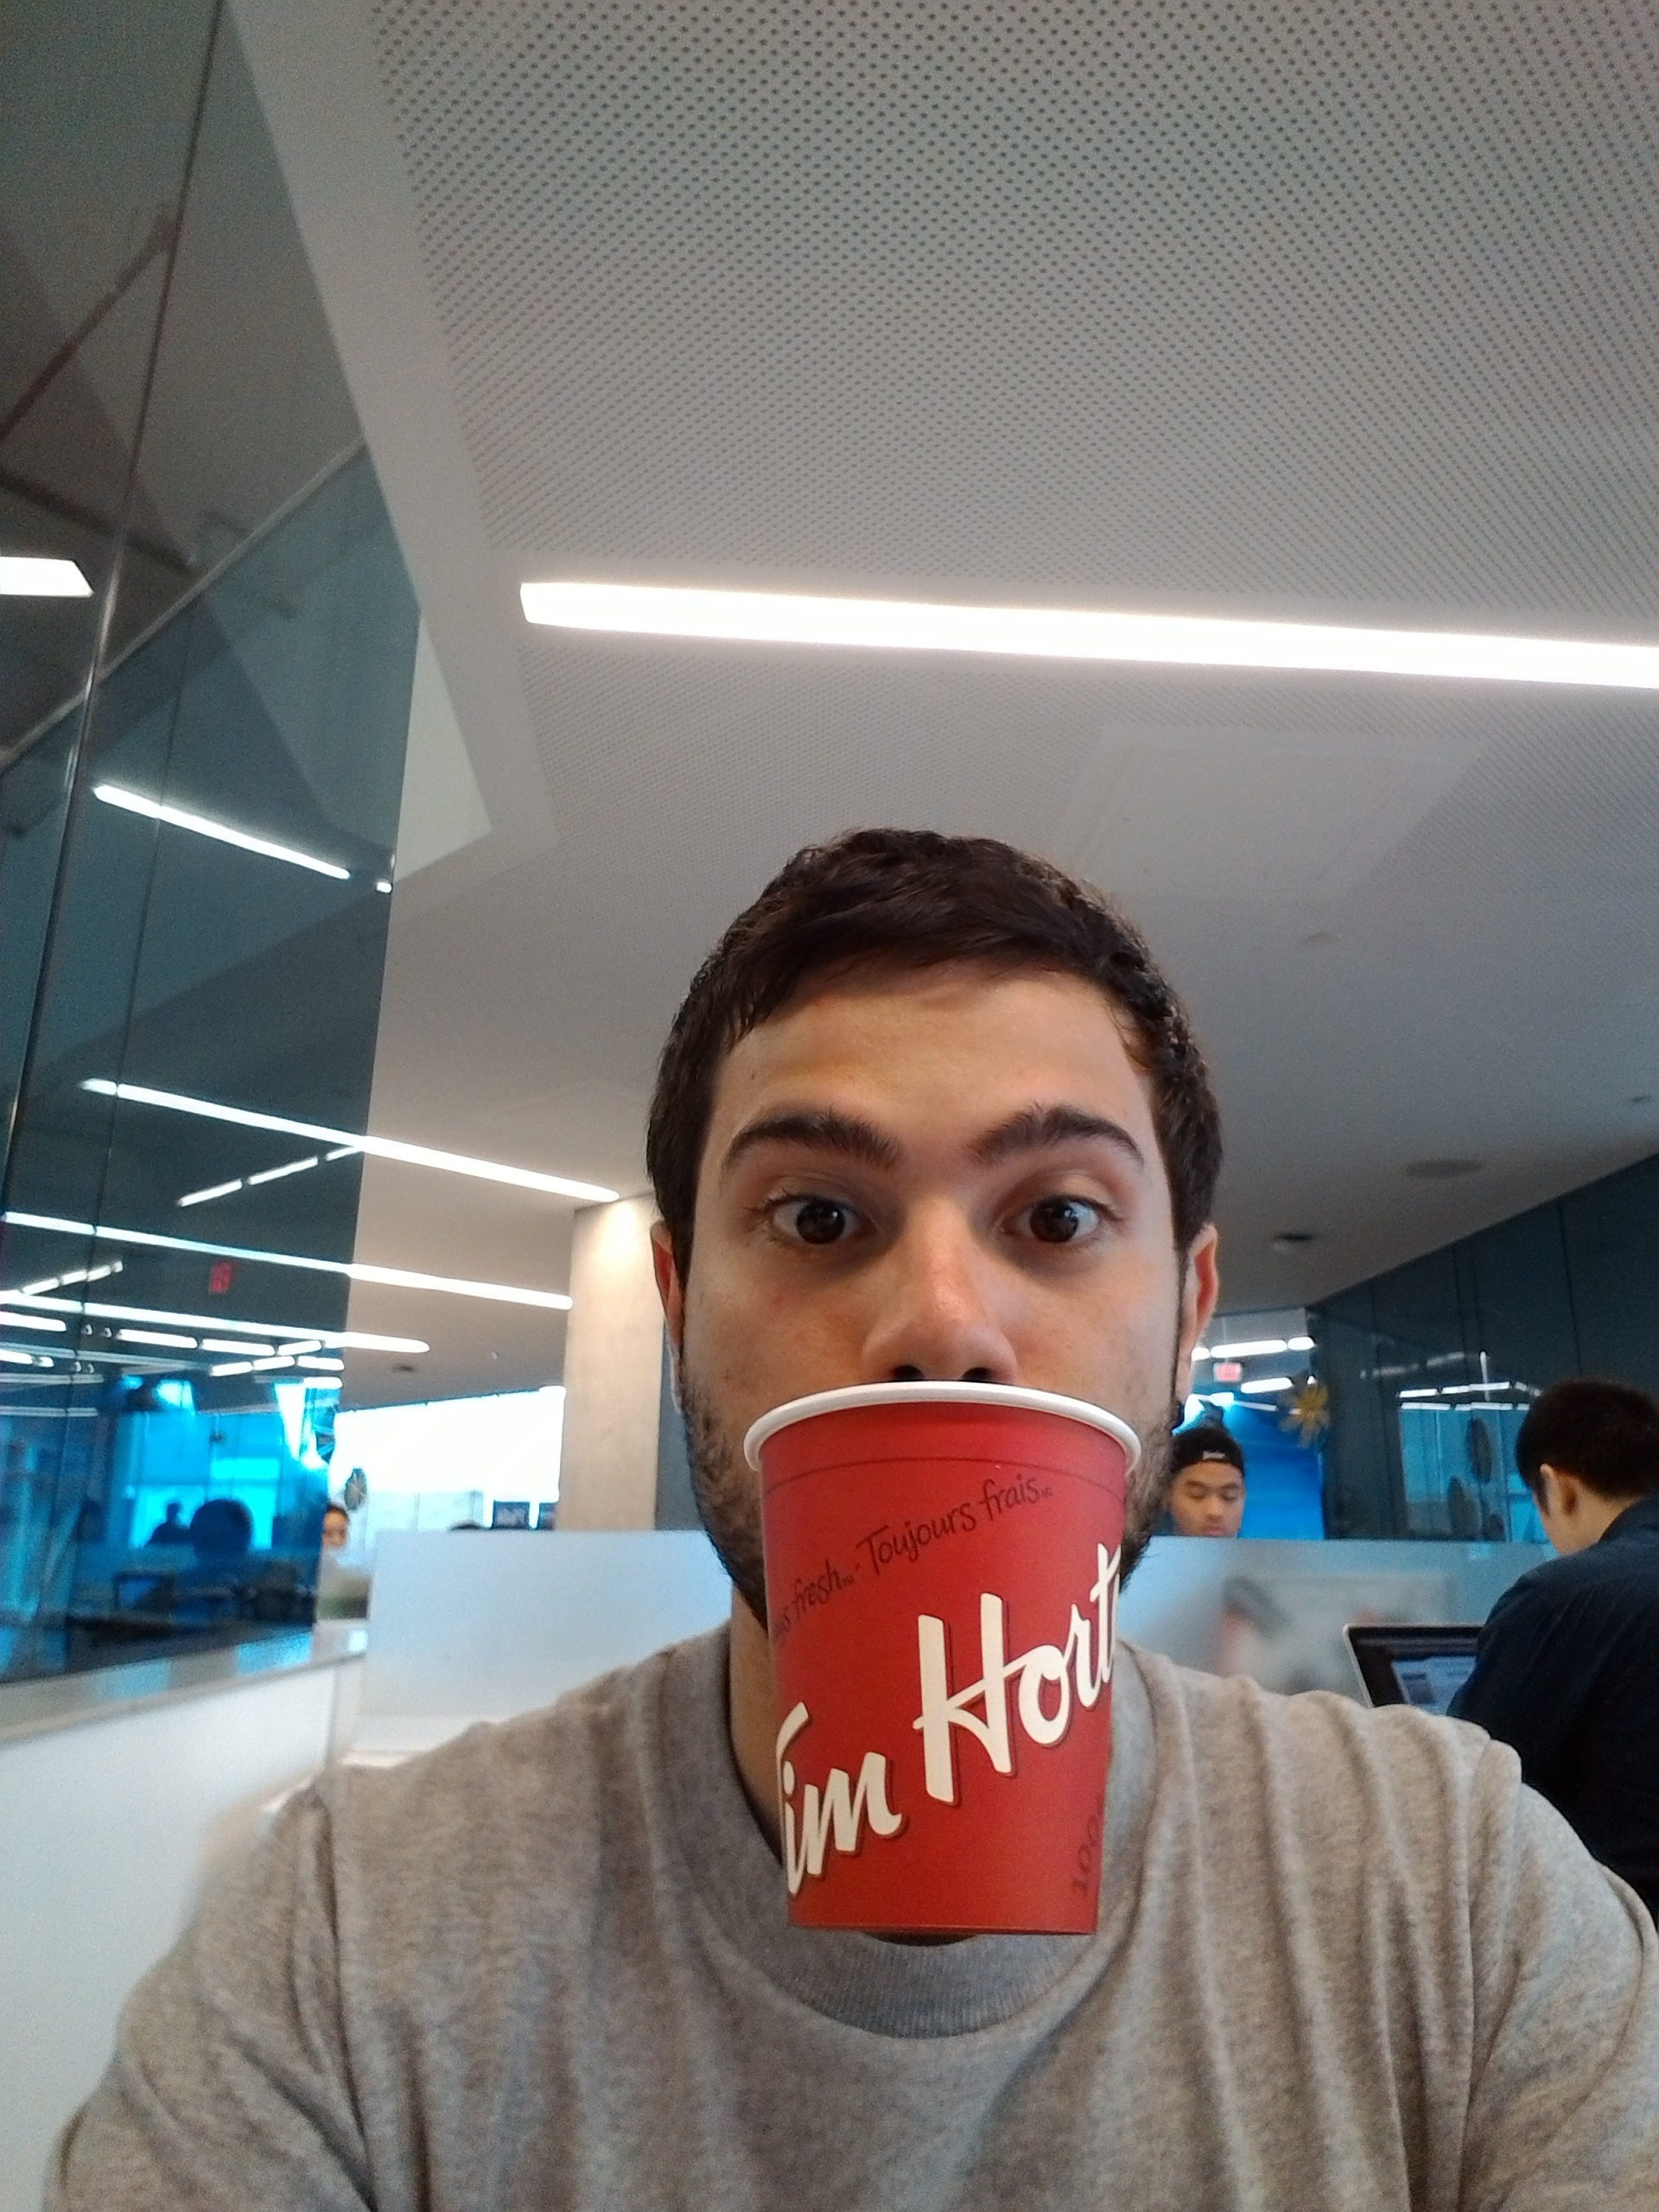 Drinking Tim Hortons